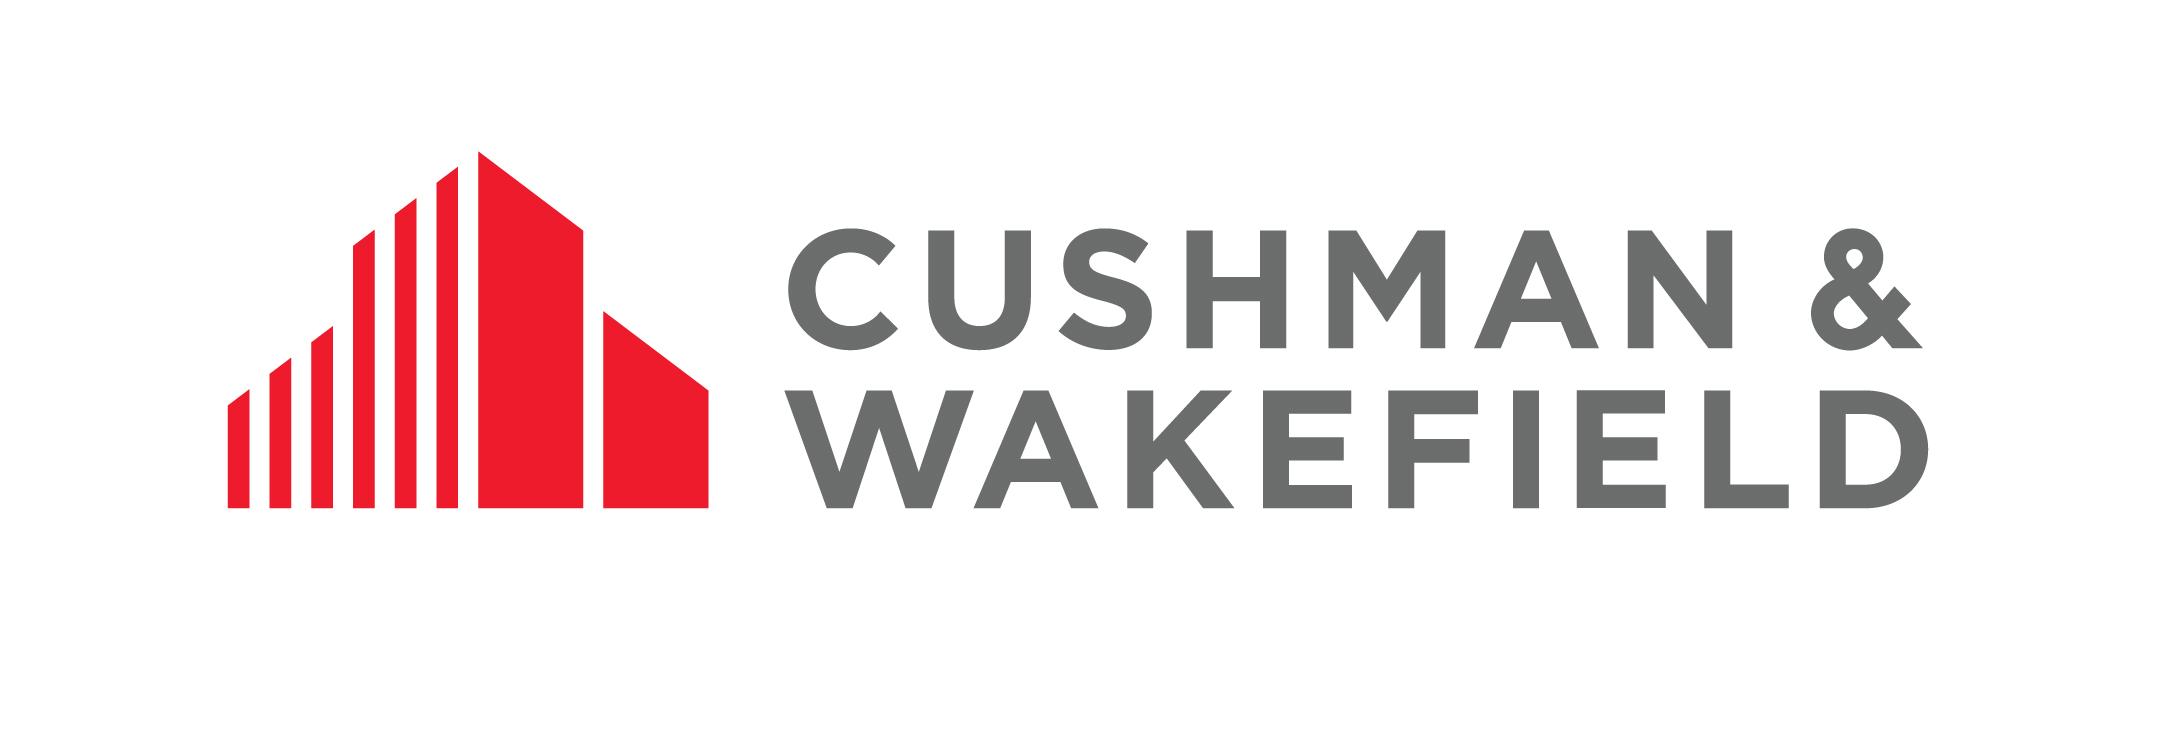 Cushman & Wakefield-US